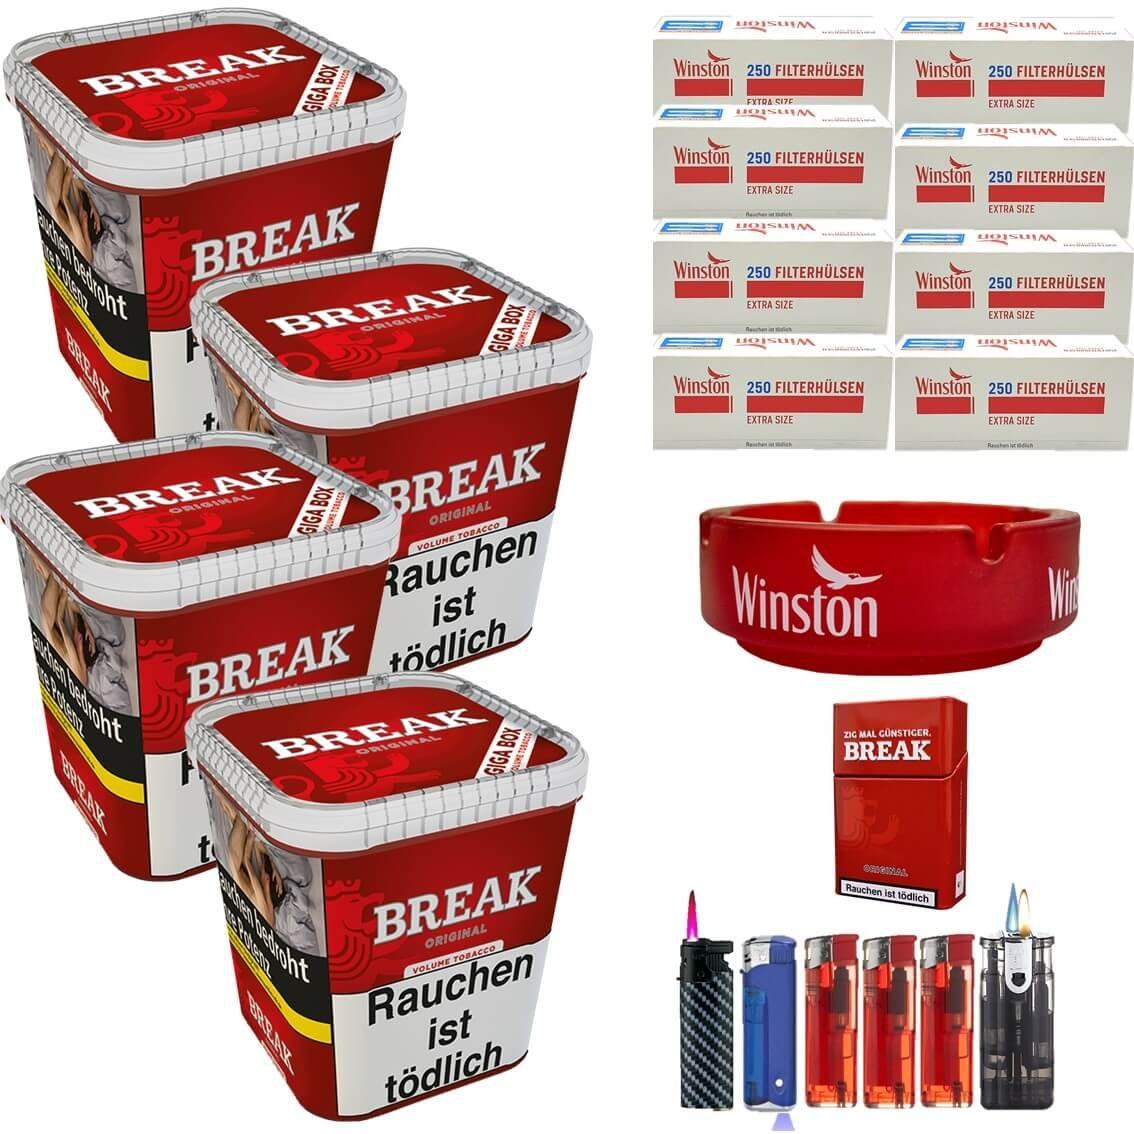 Break Original 4 x 230g Volumentabak 2000 Extra Size Filterhülsen Uvm.